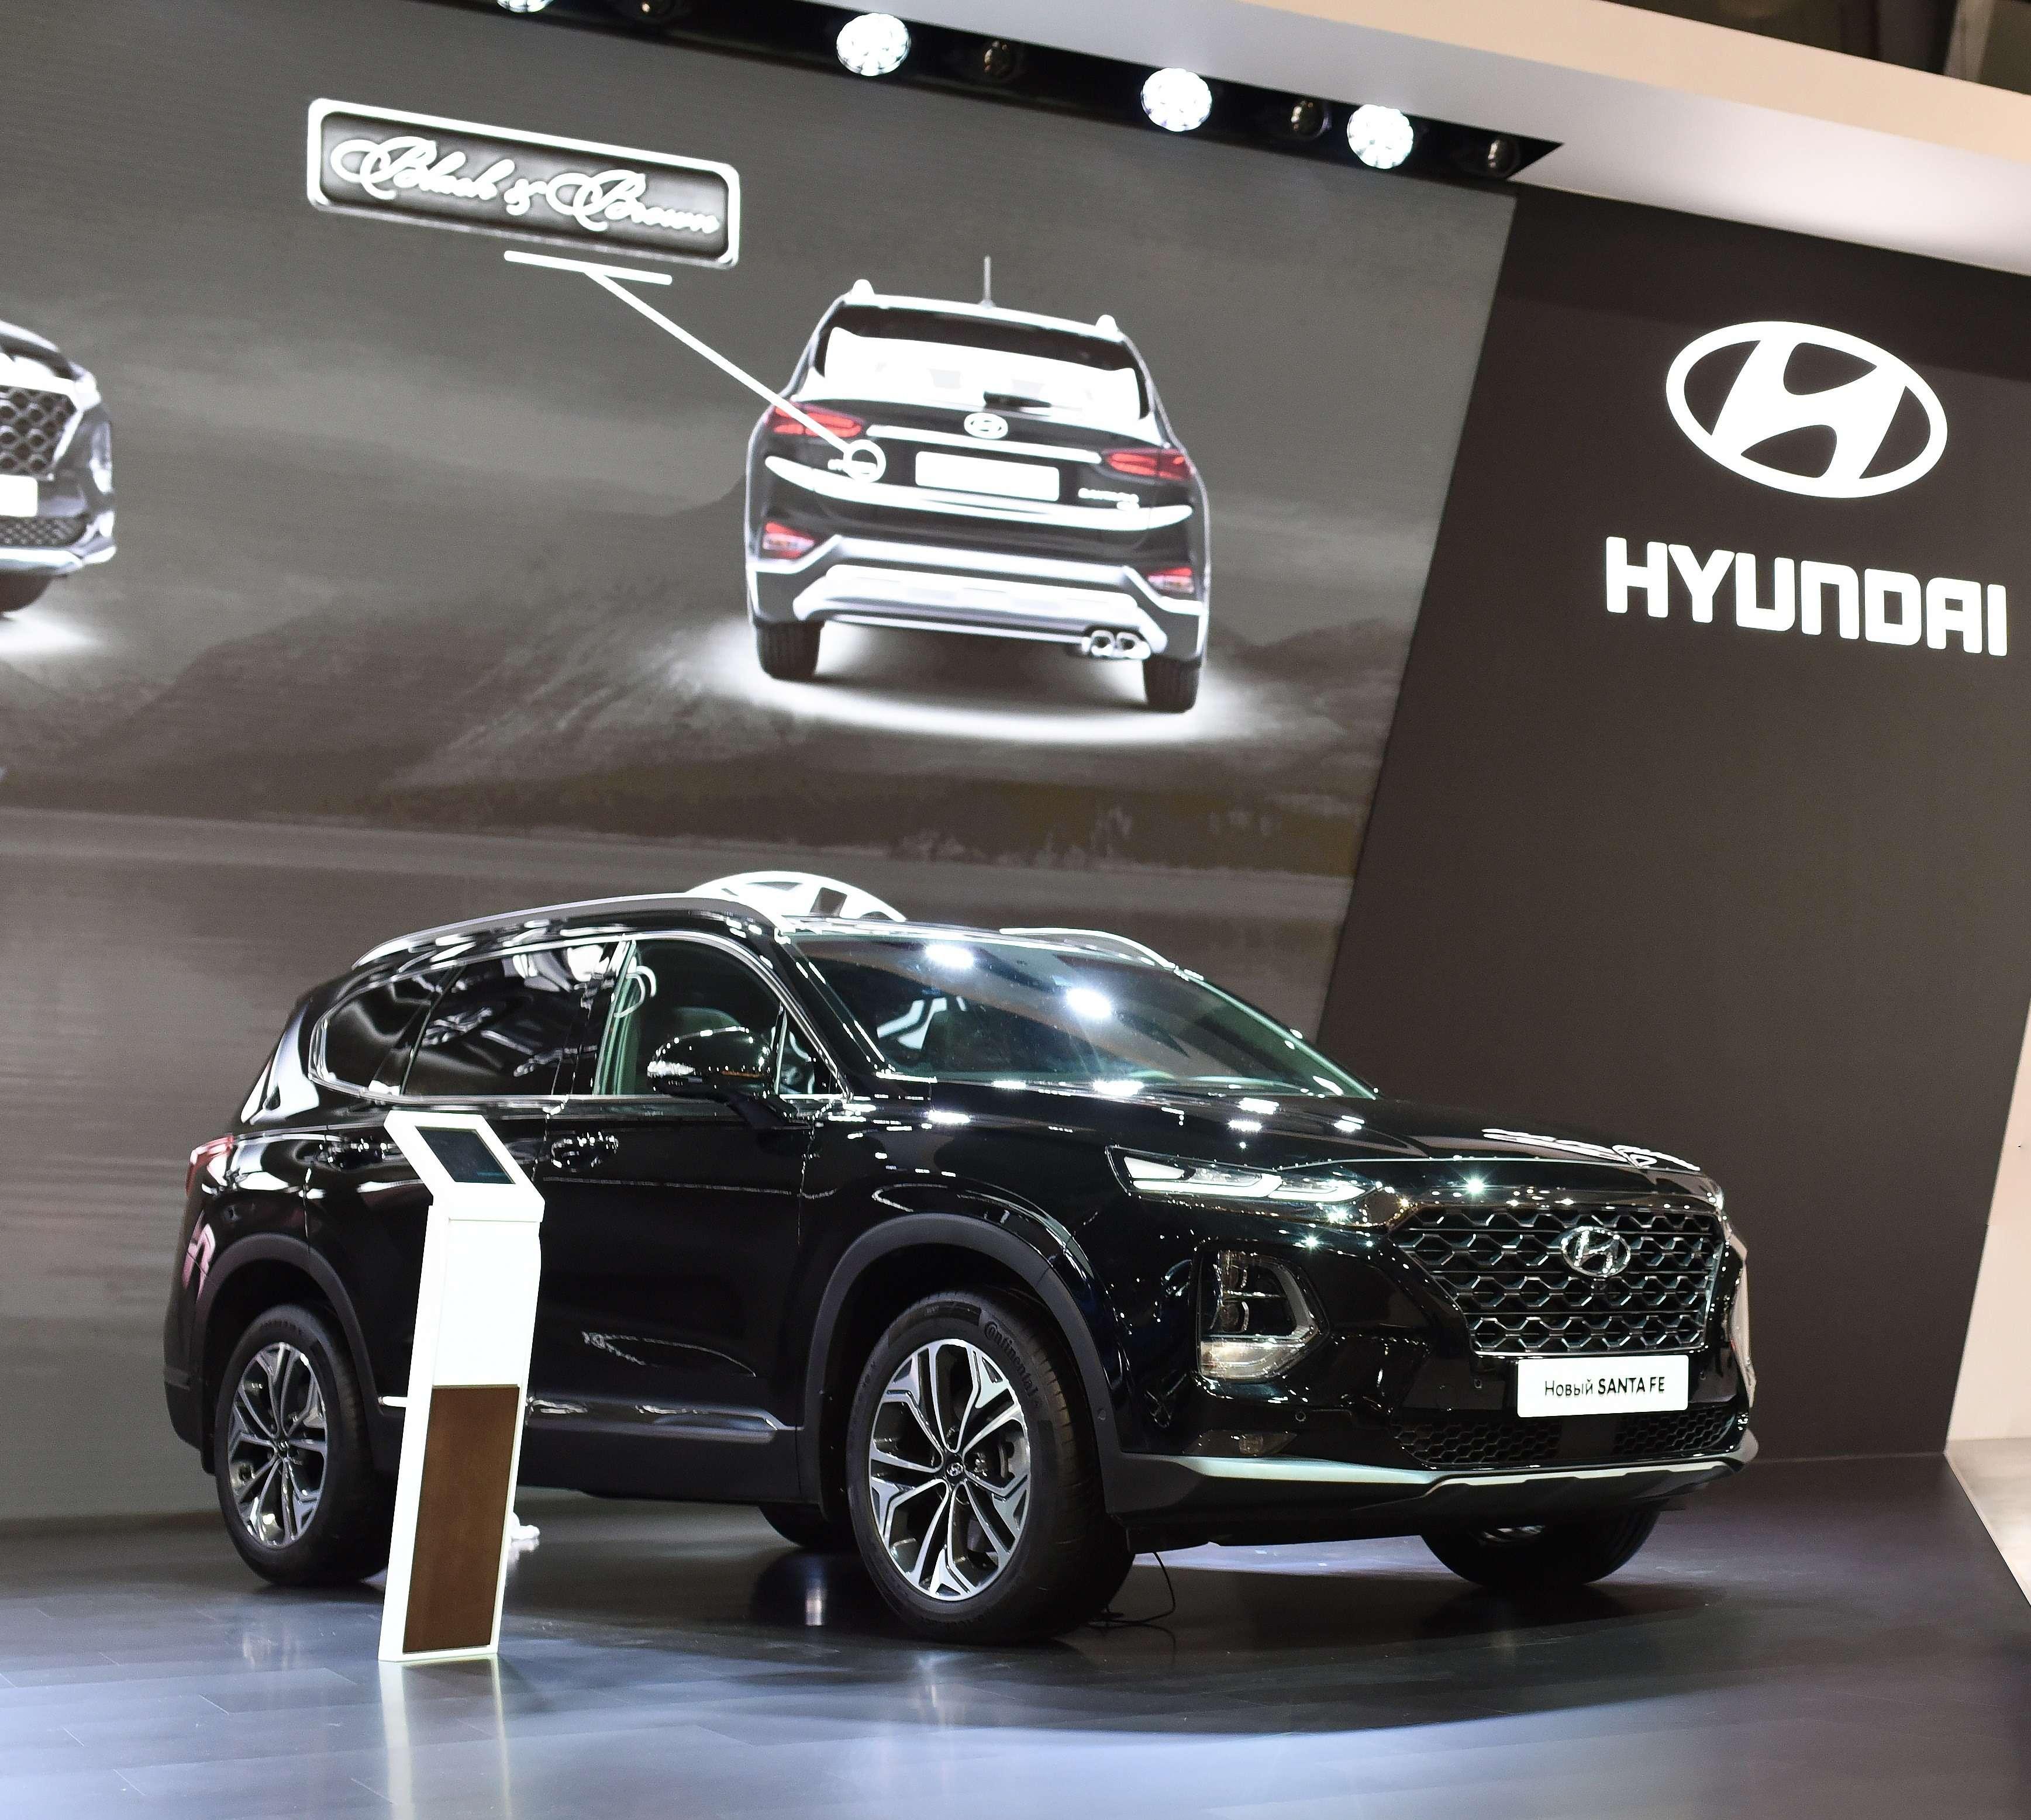 Появилась новая комплектация Hyundai Santa Fe— Black&Brown— фото 900663